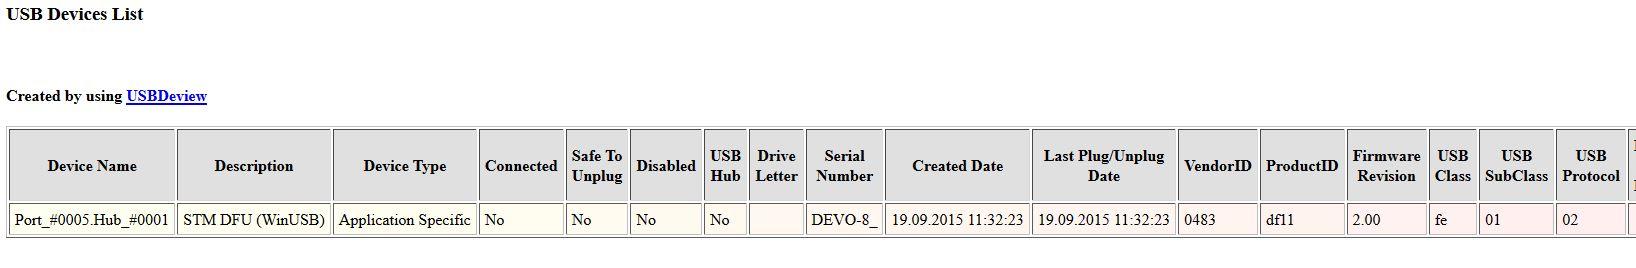 USBDeview.JPG